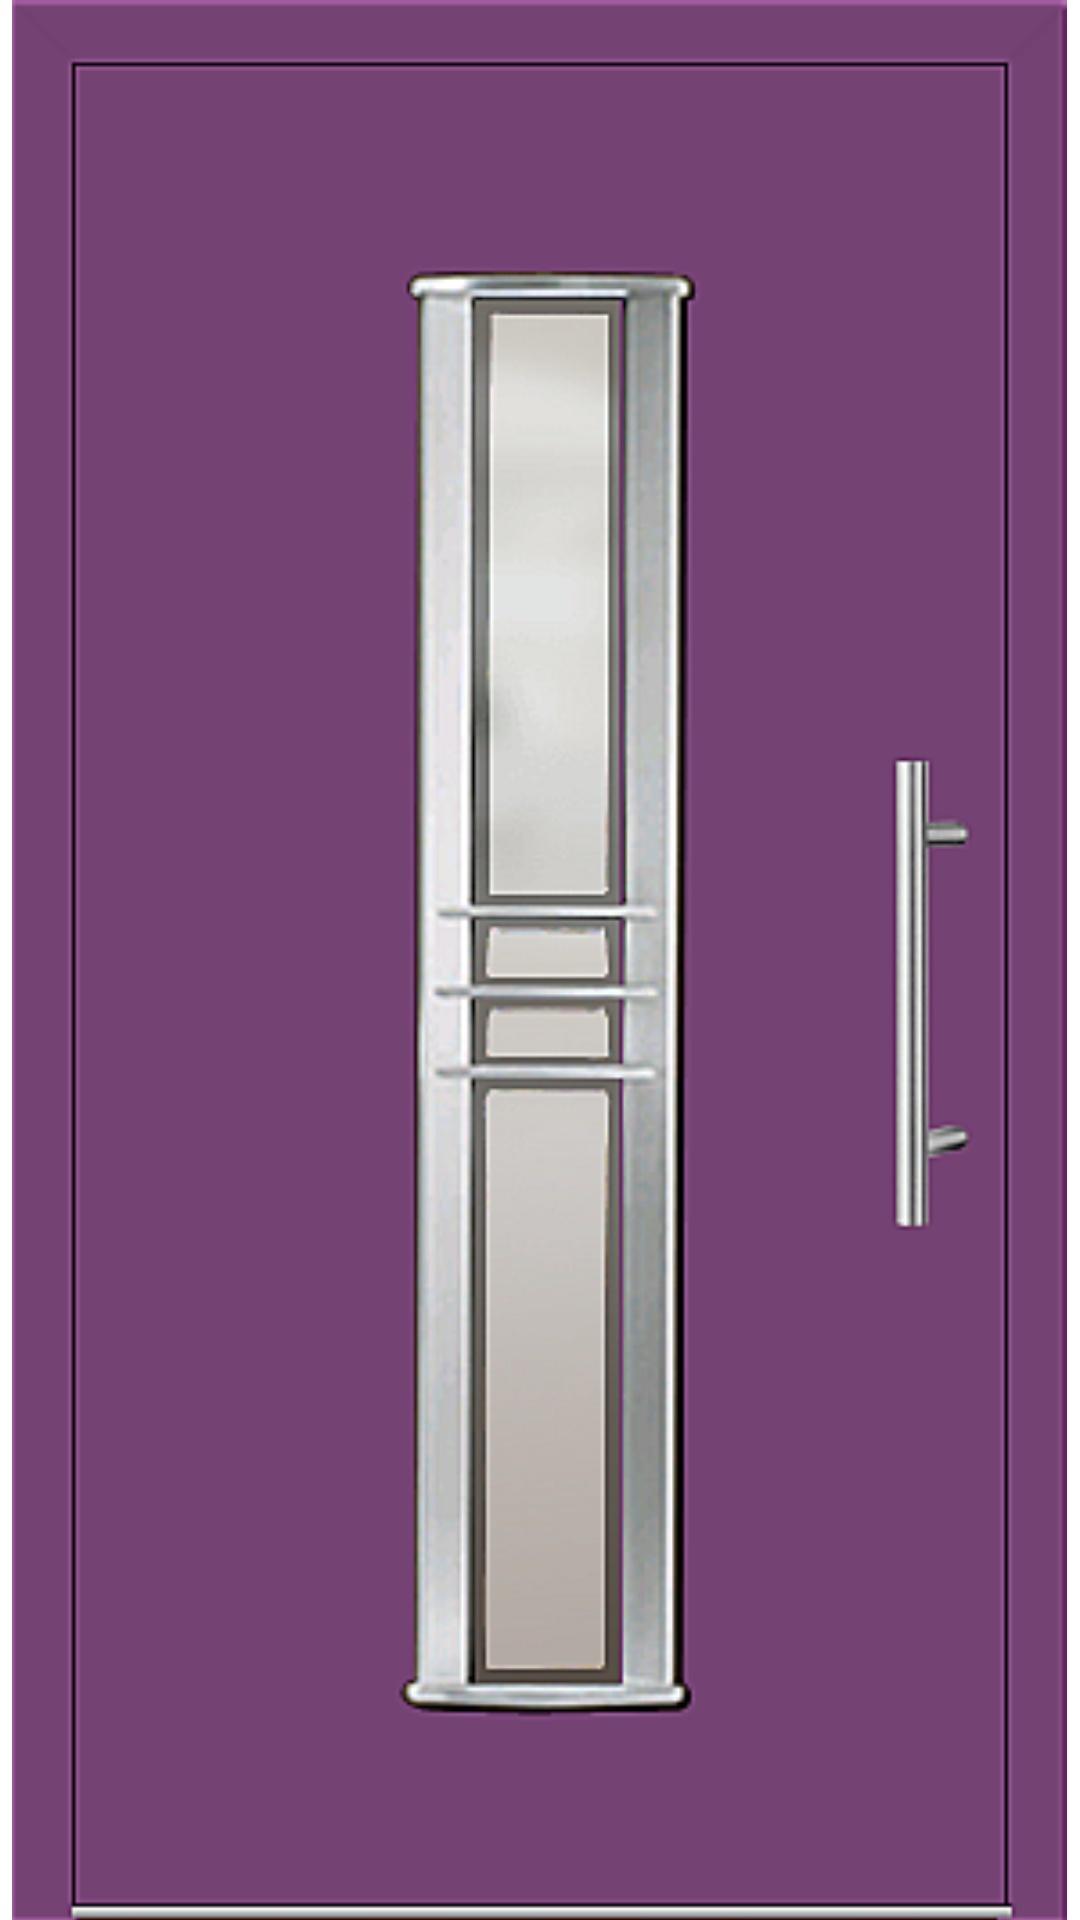 Aluminium Haustür Modell 6963-79 singalviolett